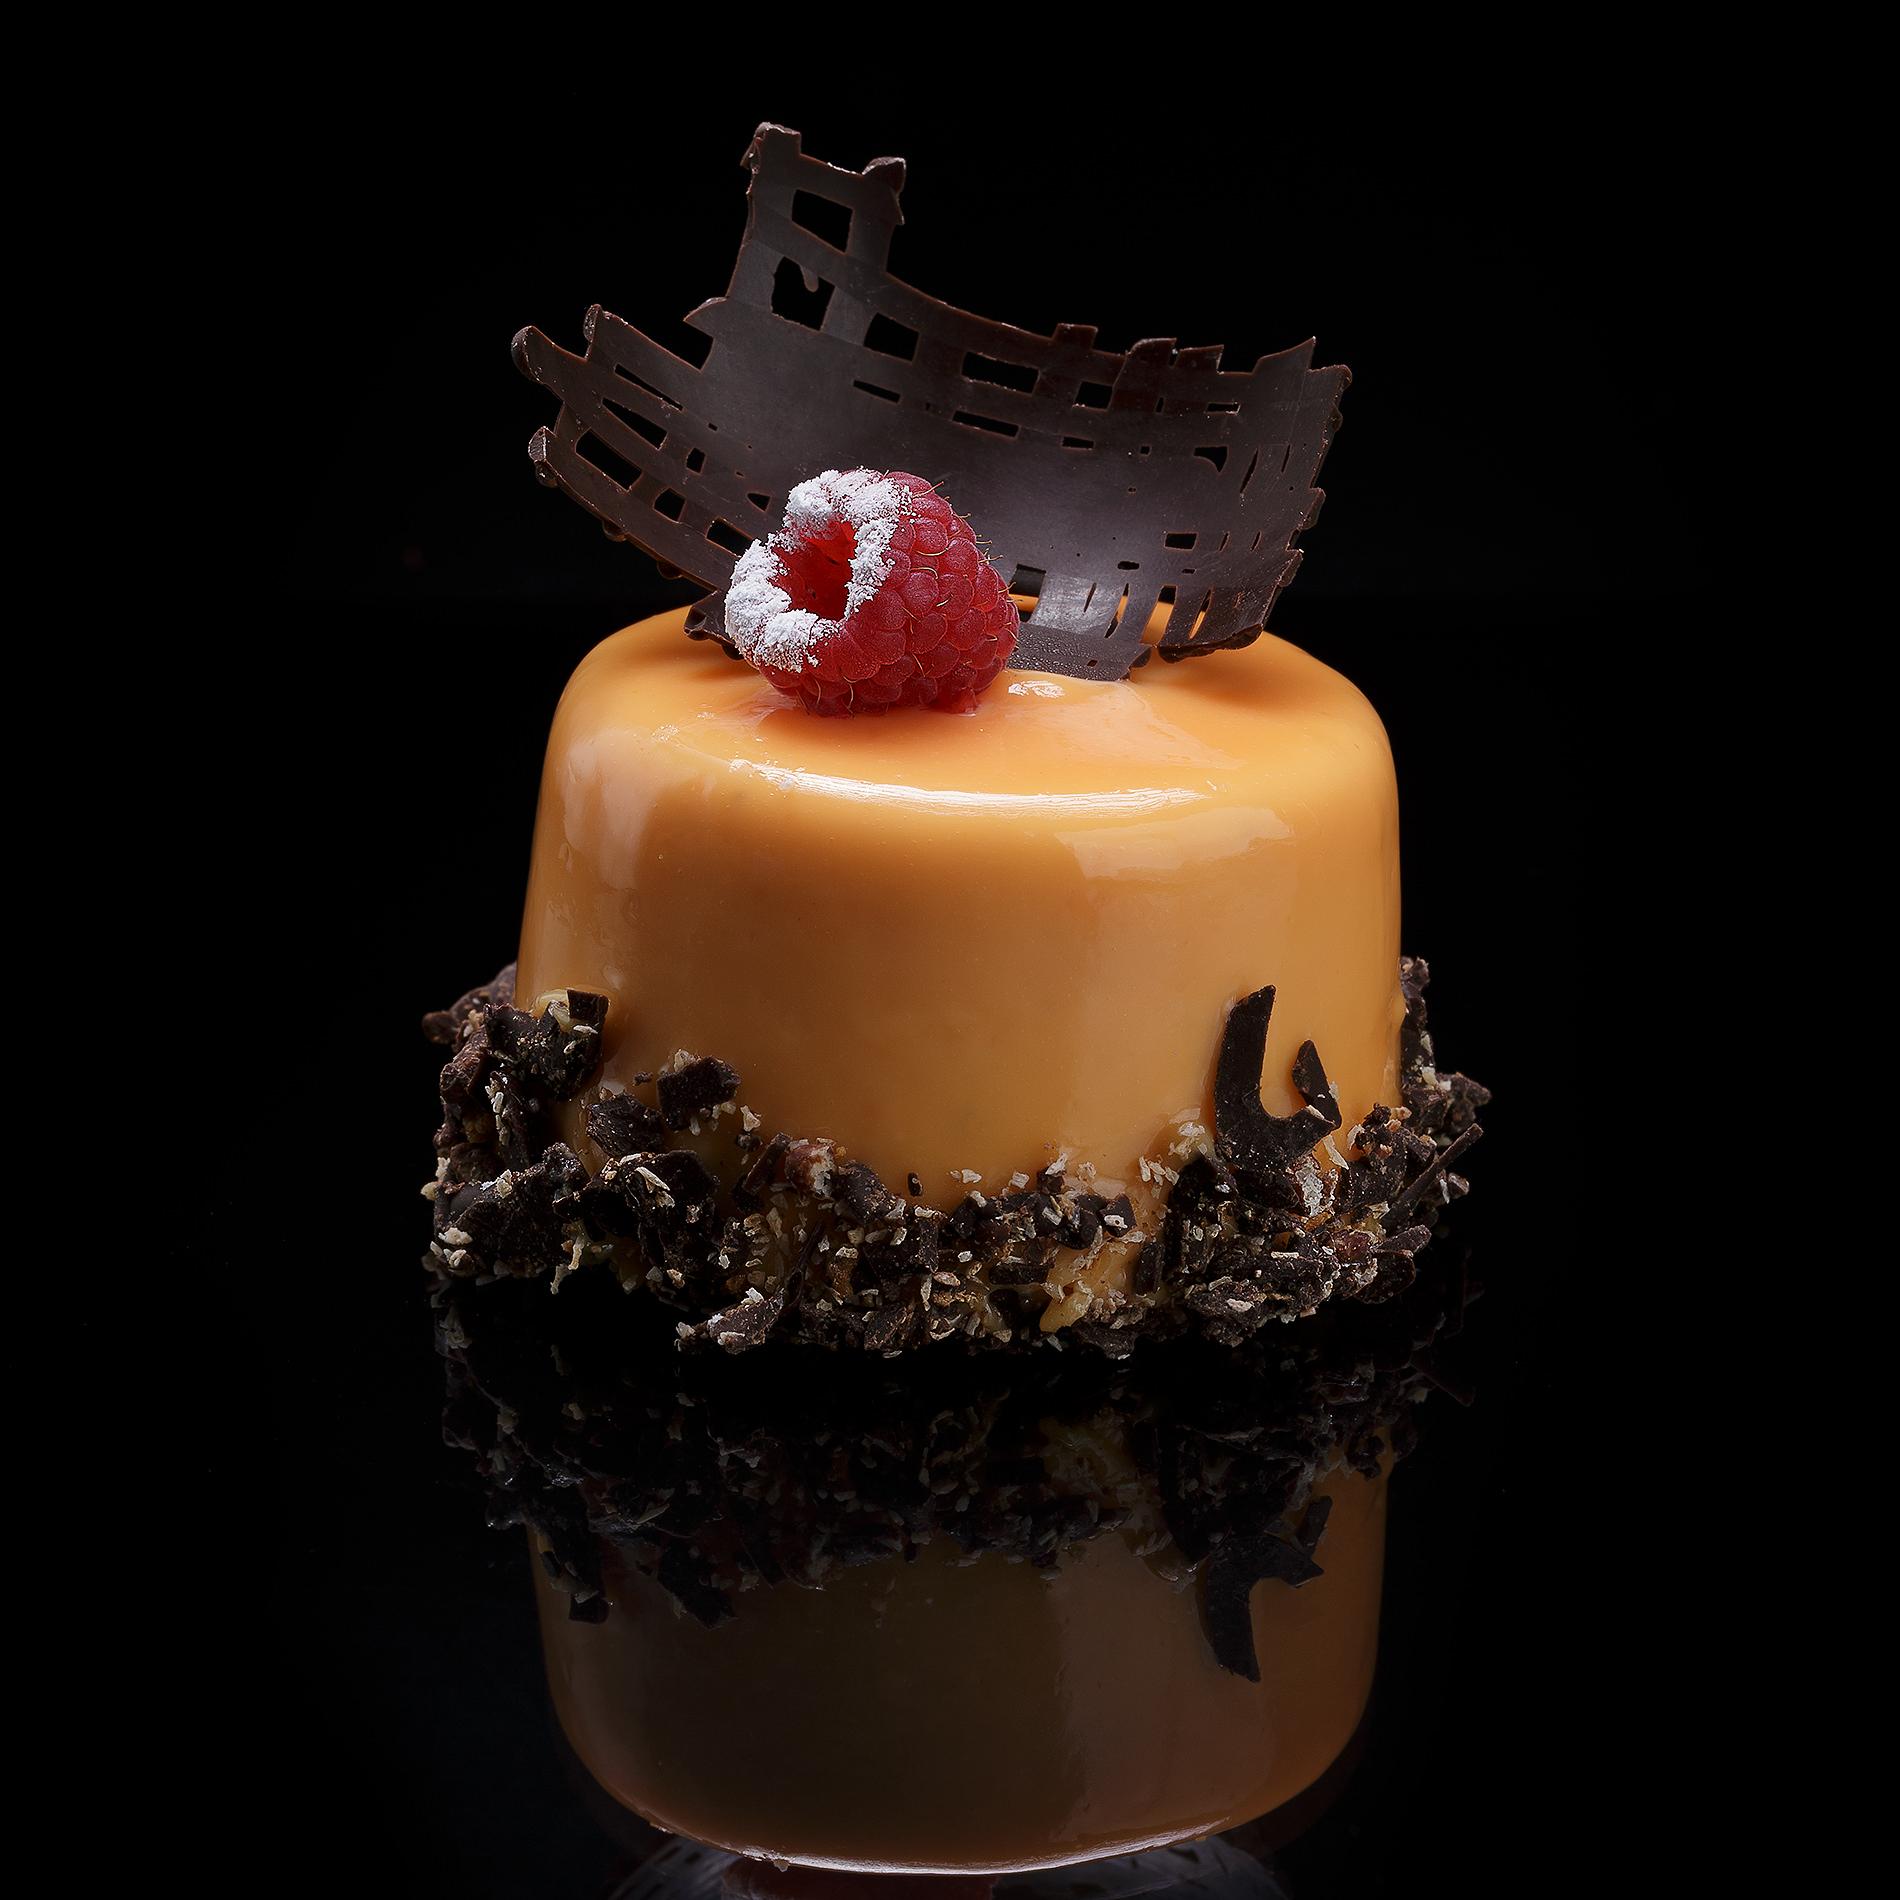 postres, food photography, fotografía de alimentos, marcosvaldés